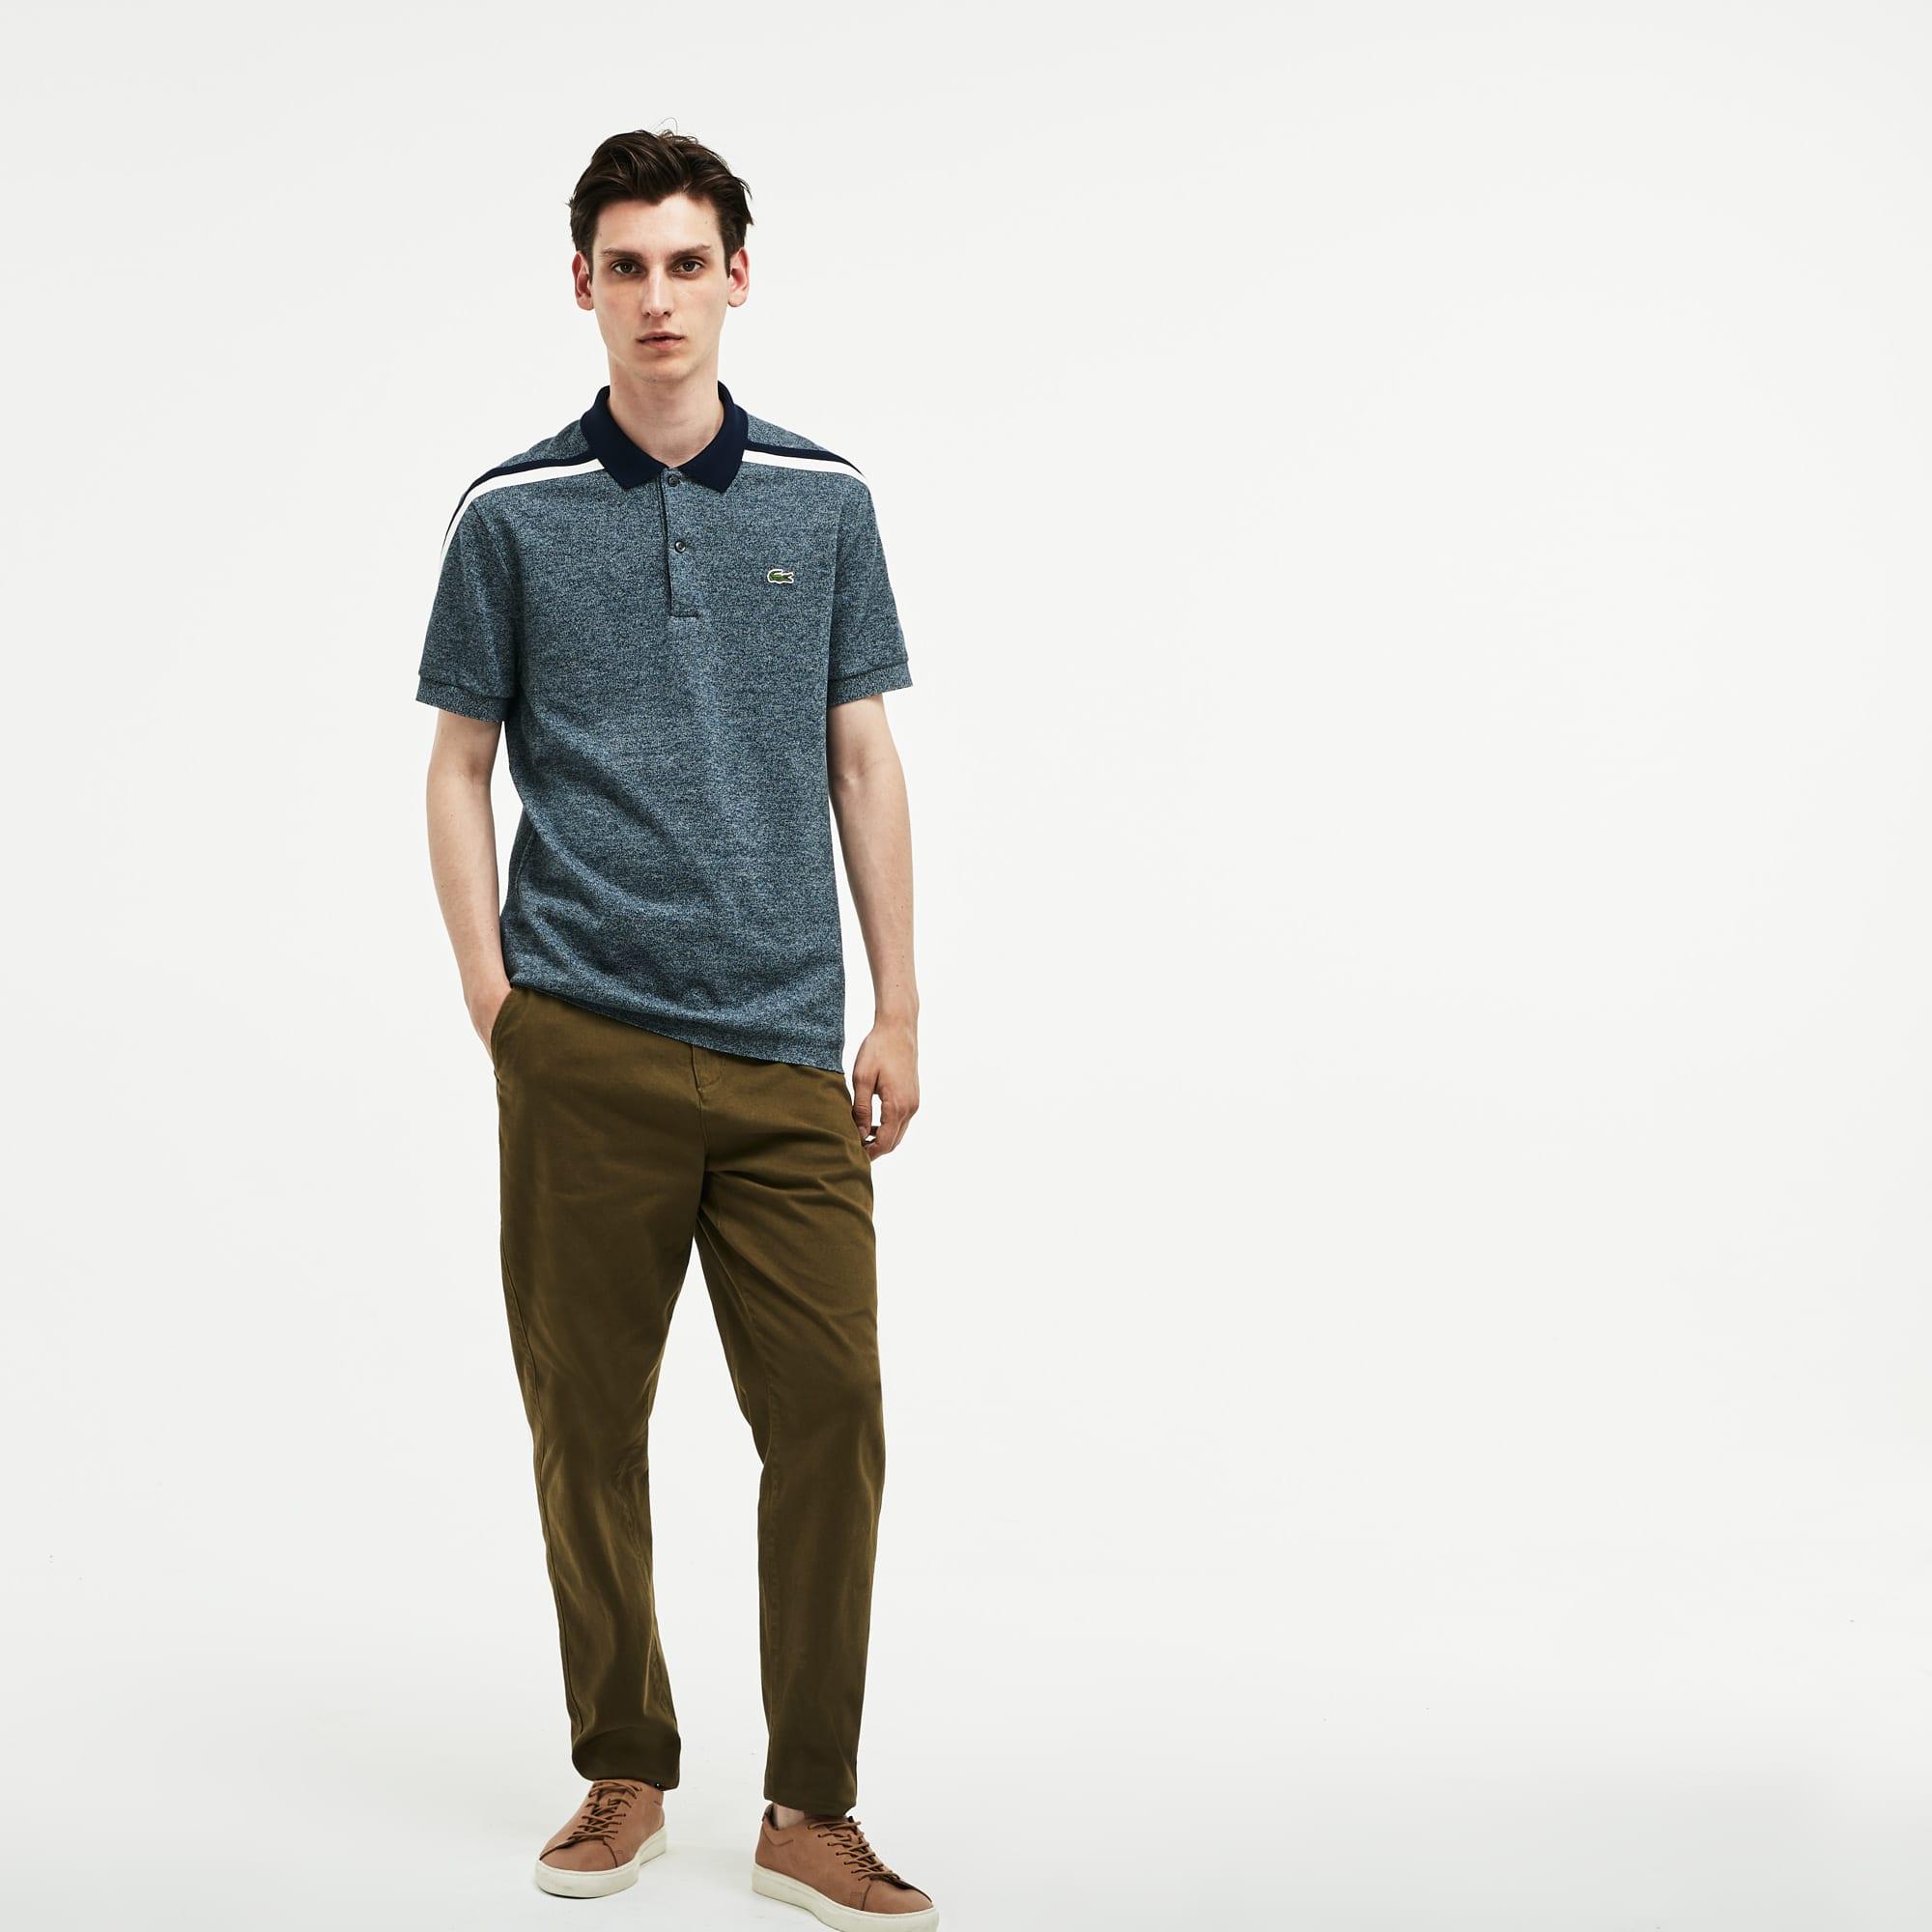 Lacoste - LACOSTE Made In France Regular Fit Herren-Poloshirt aus Baumwoll-Piqué - 4